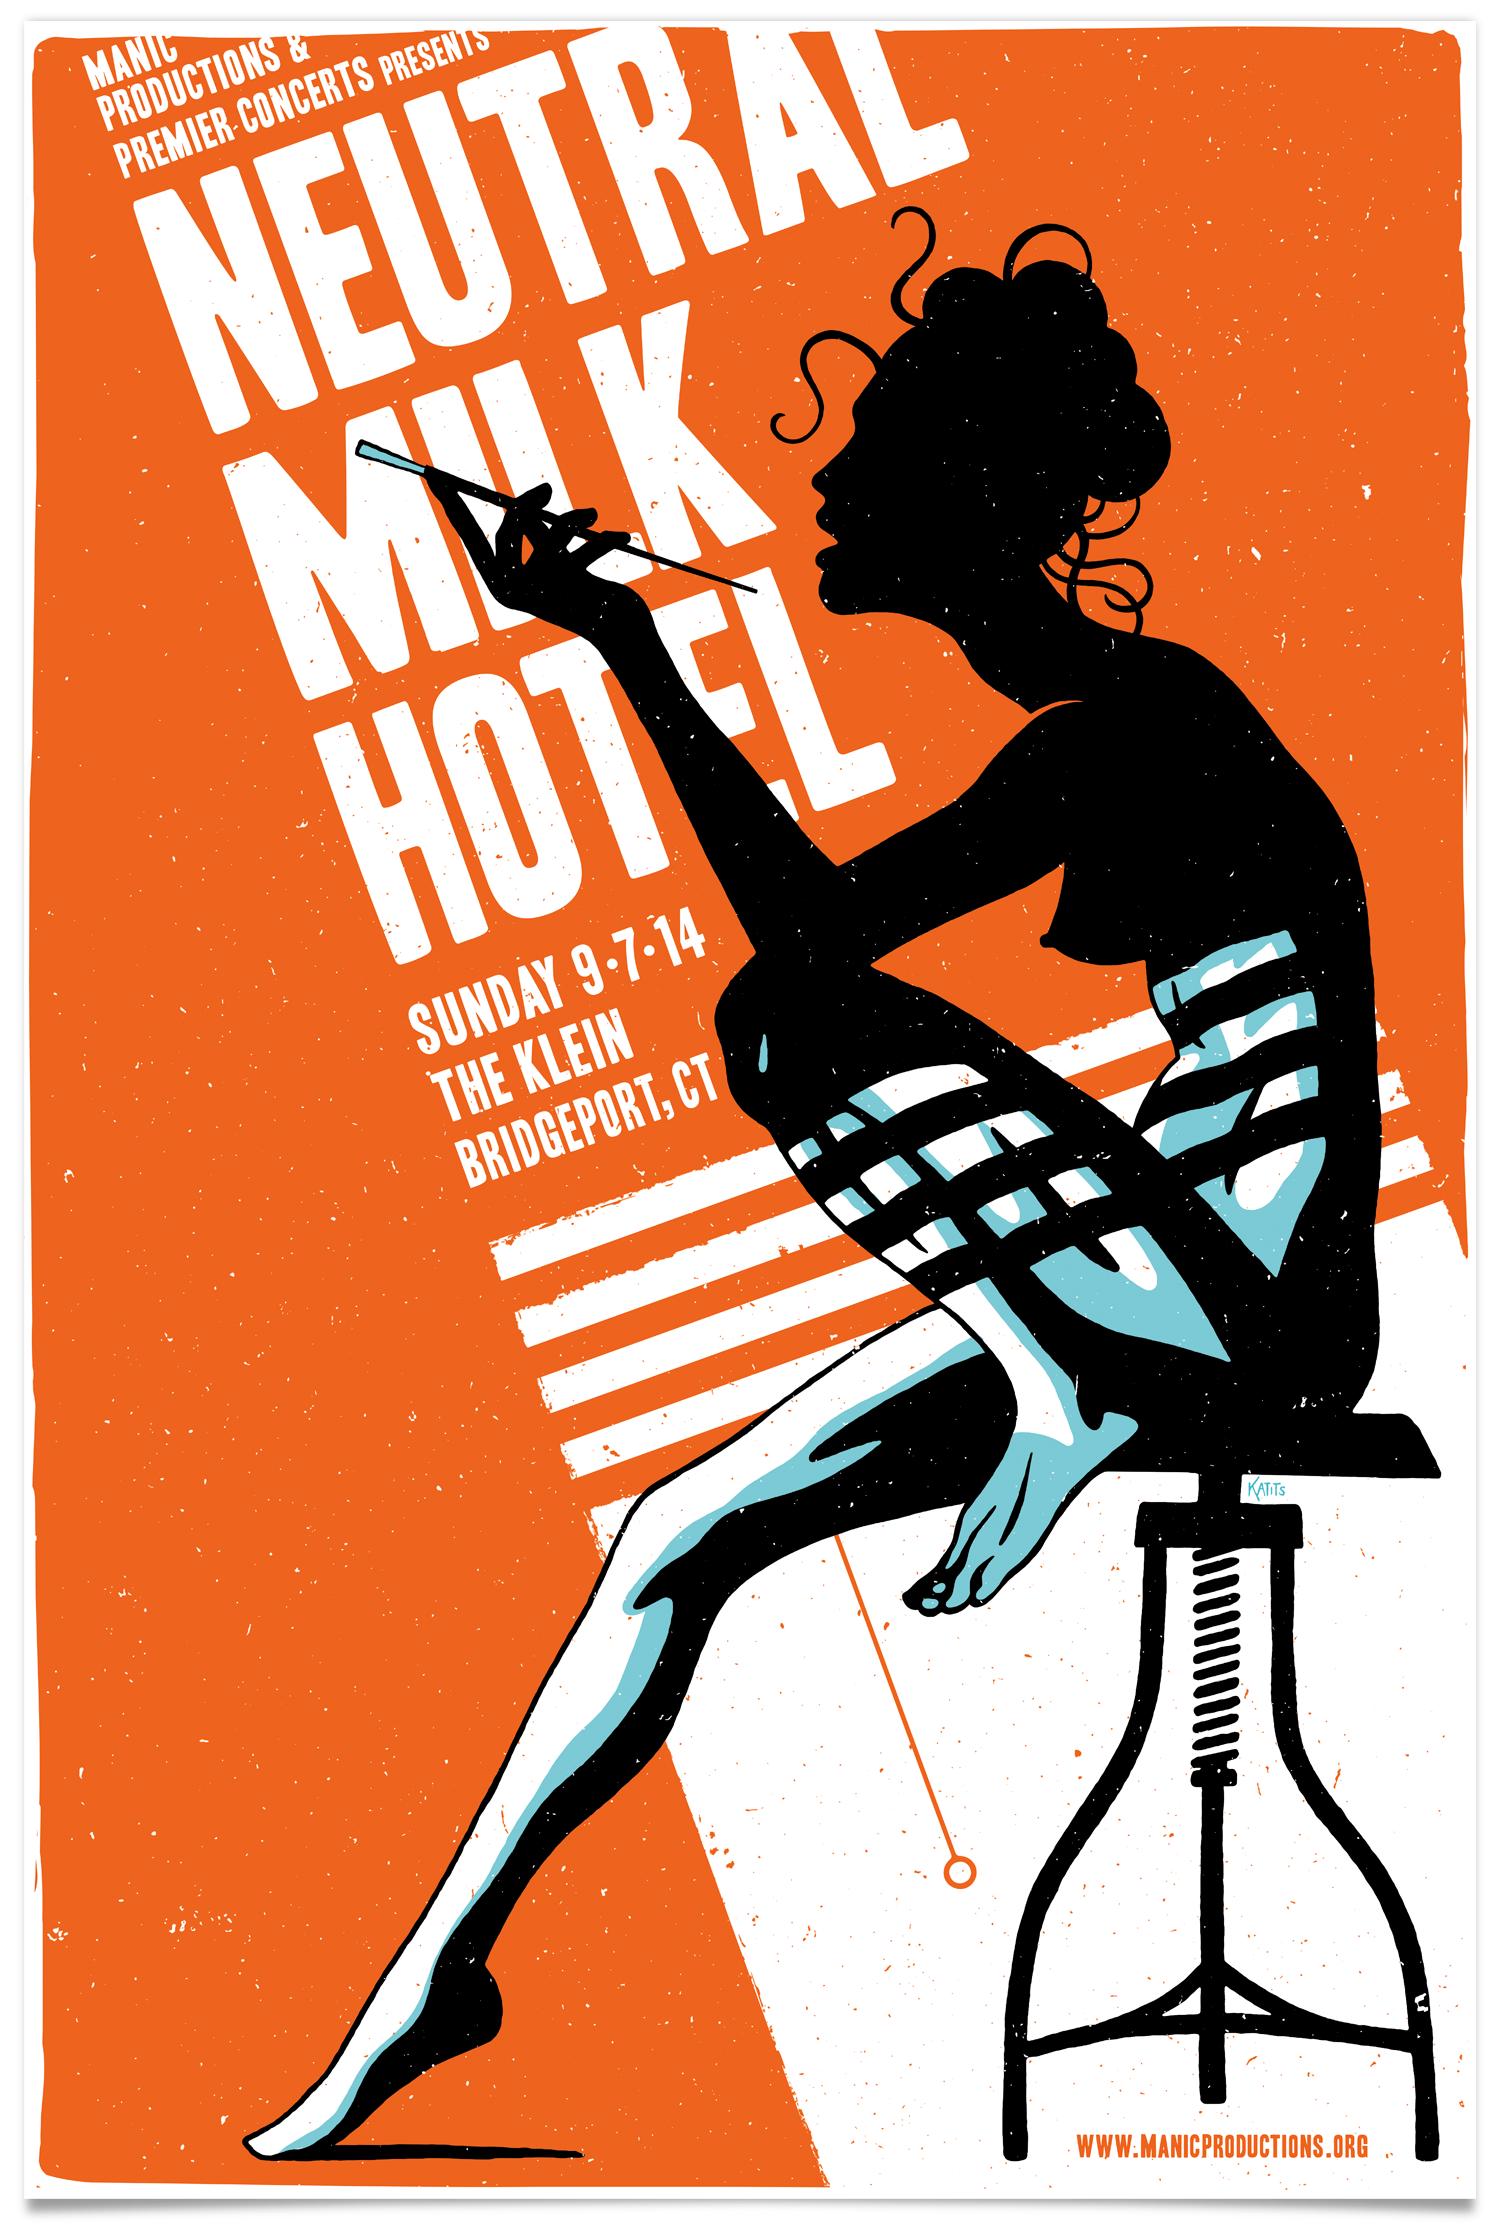 NeutralMilkHotel_poster2.png